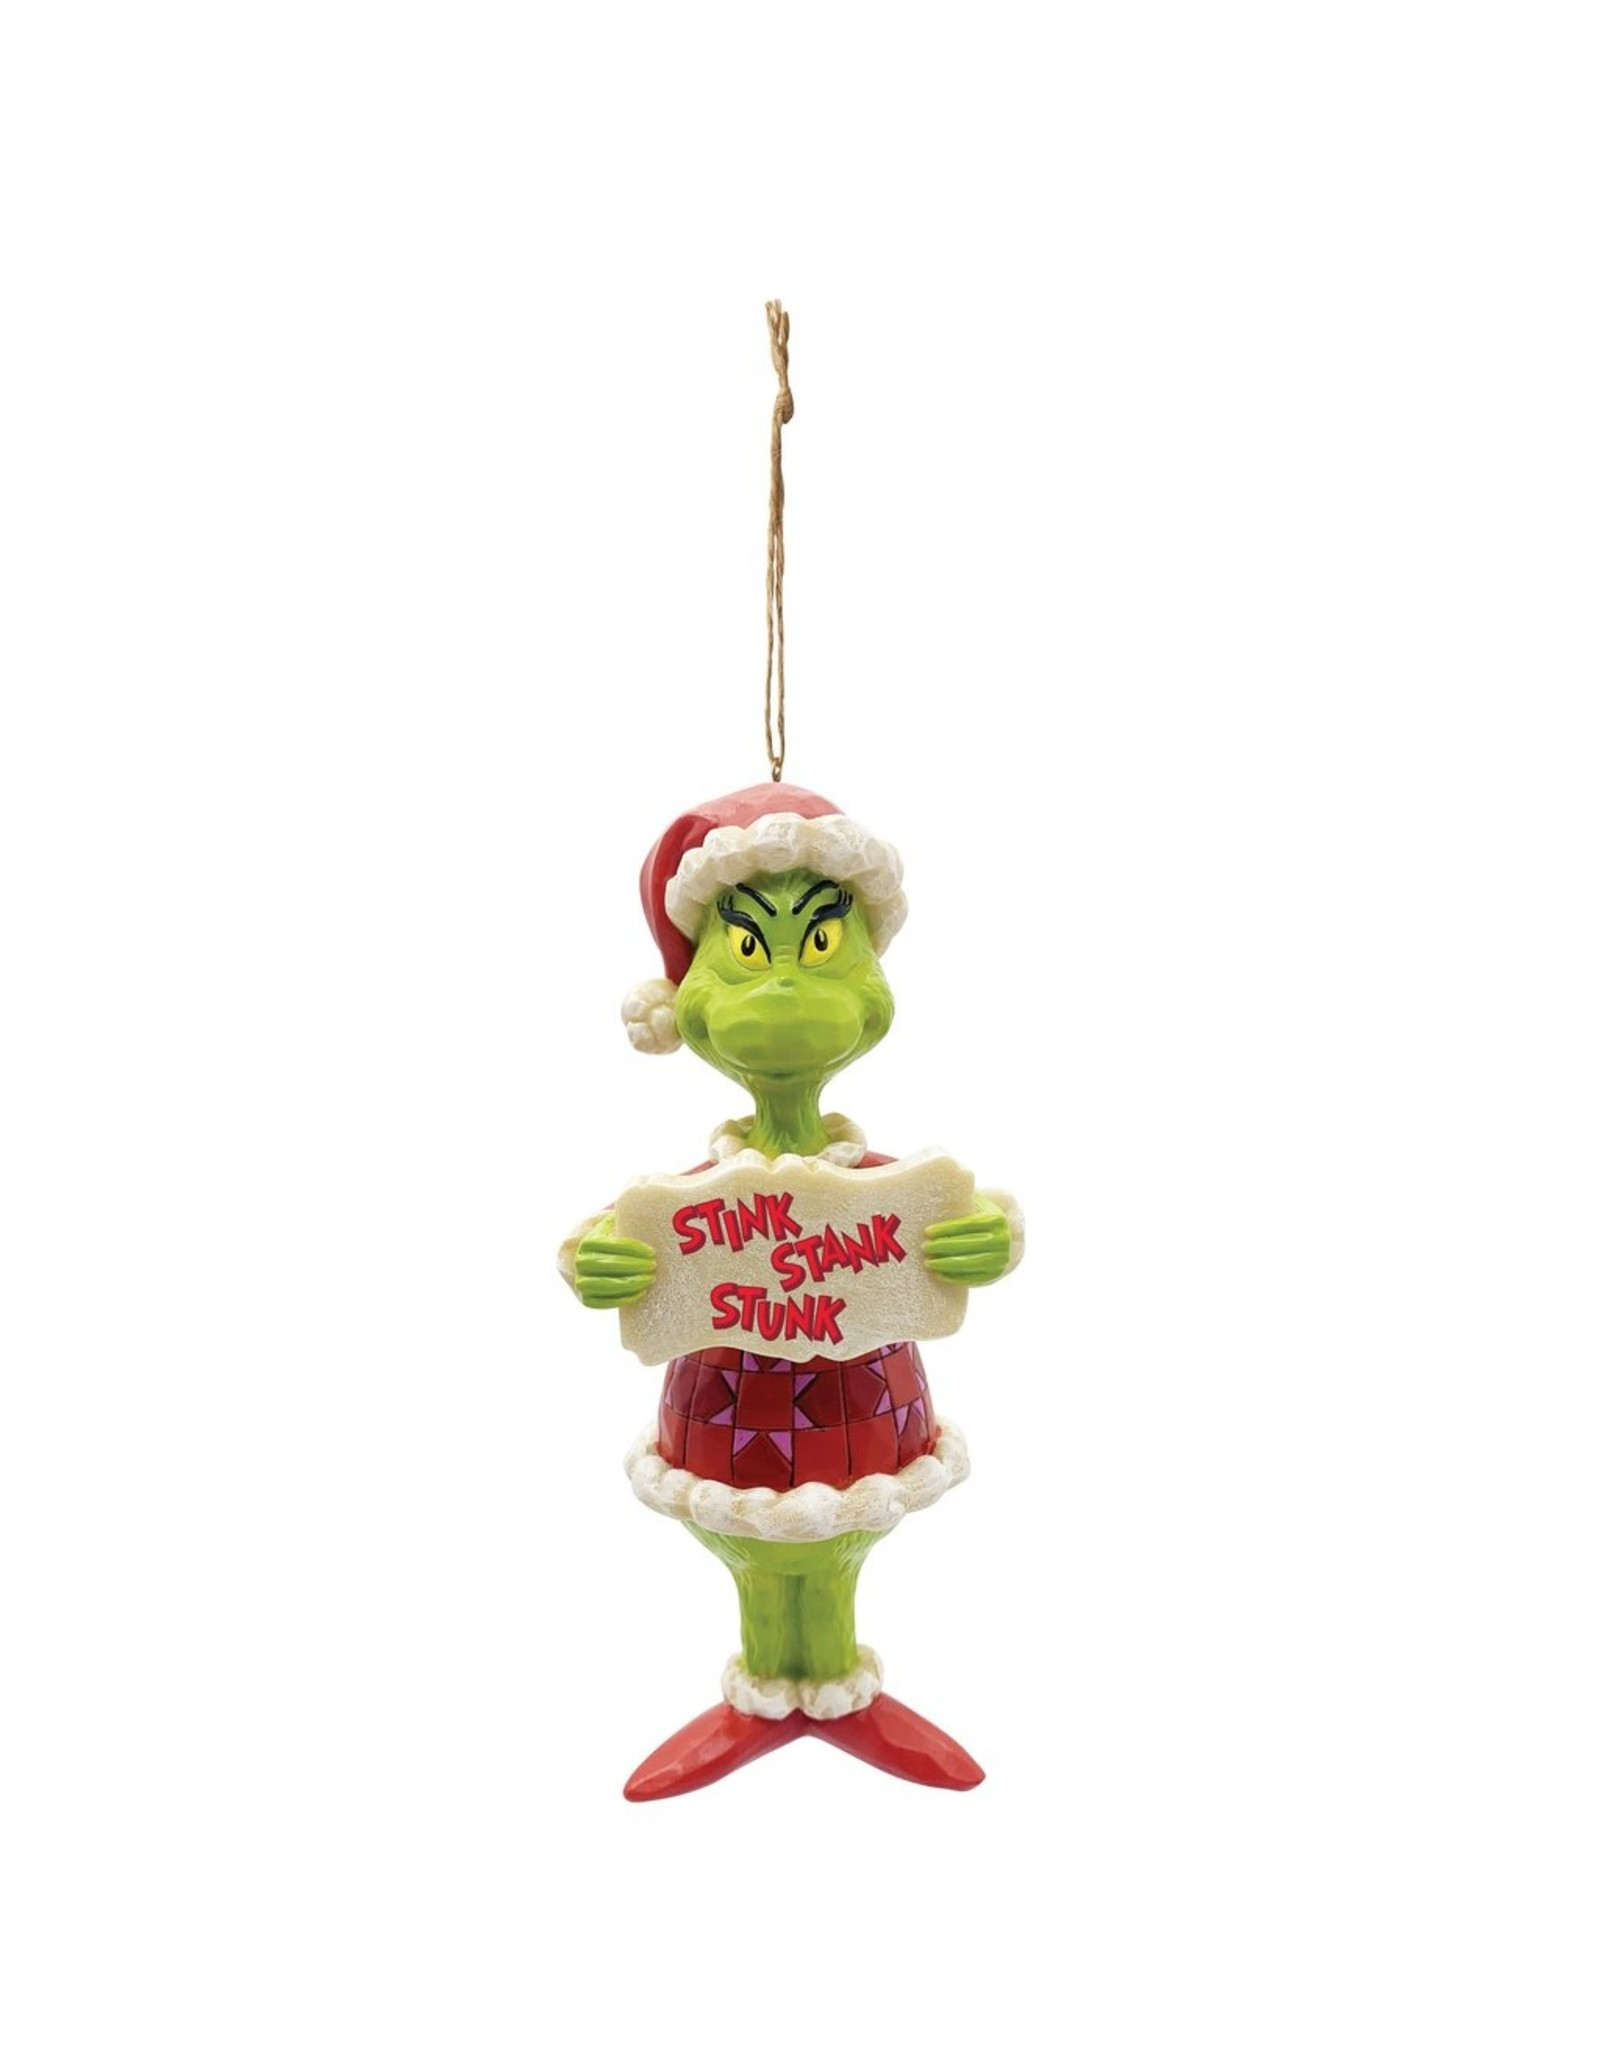 Jim Shore Grinch Stink Stank Stunk Ornament